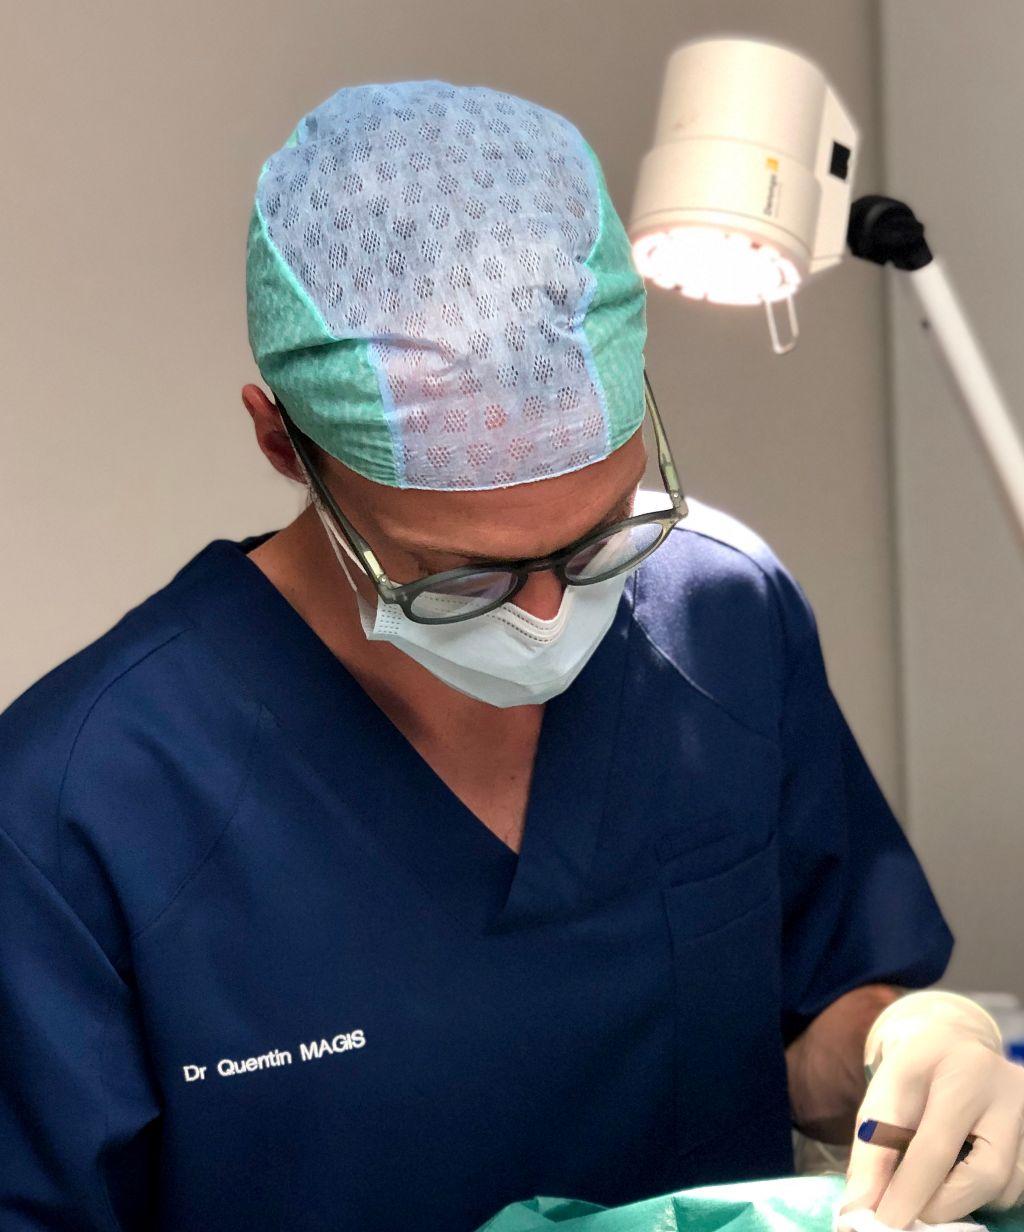 chirurgien dermatologue lyon quentin magis